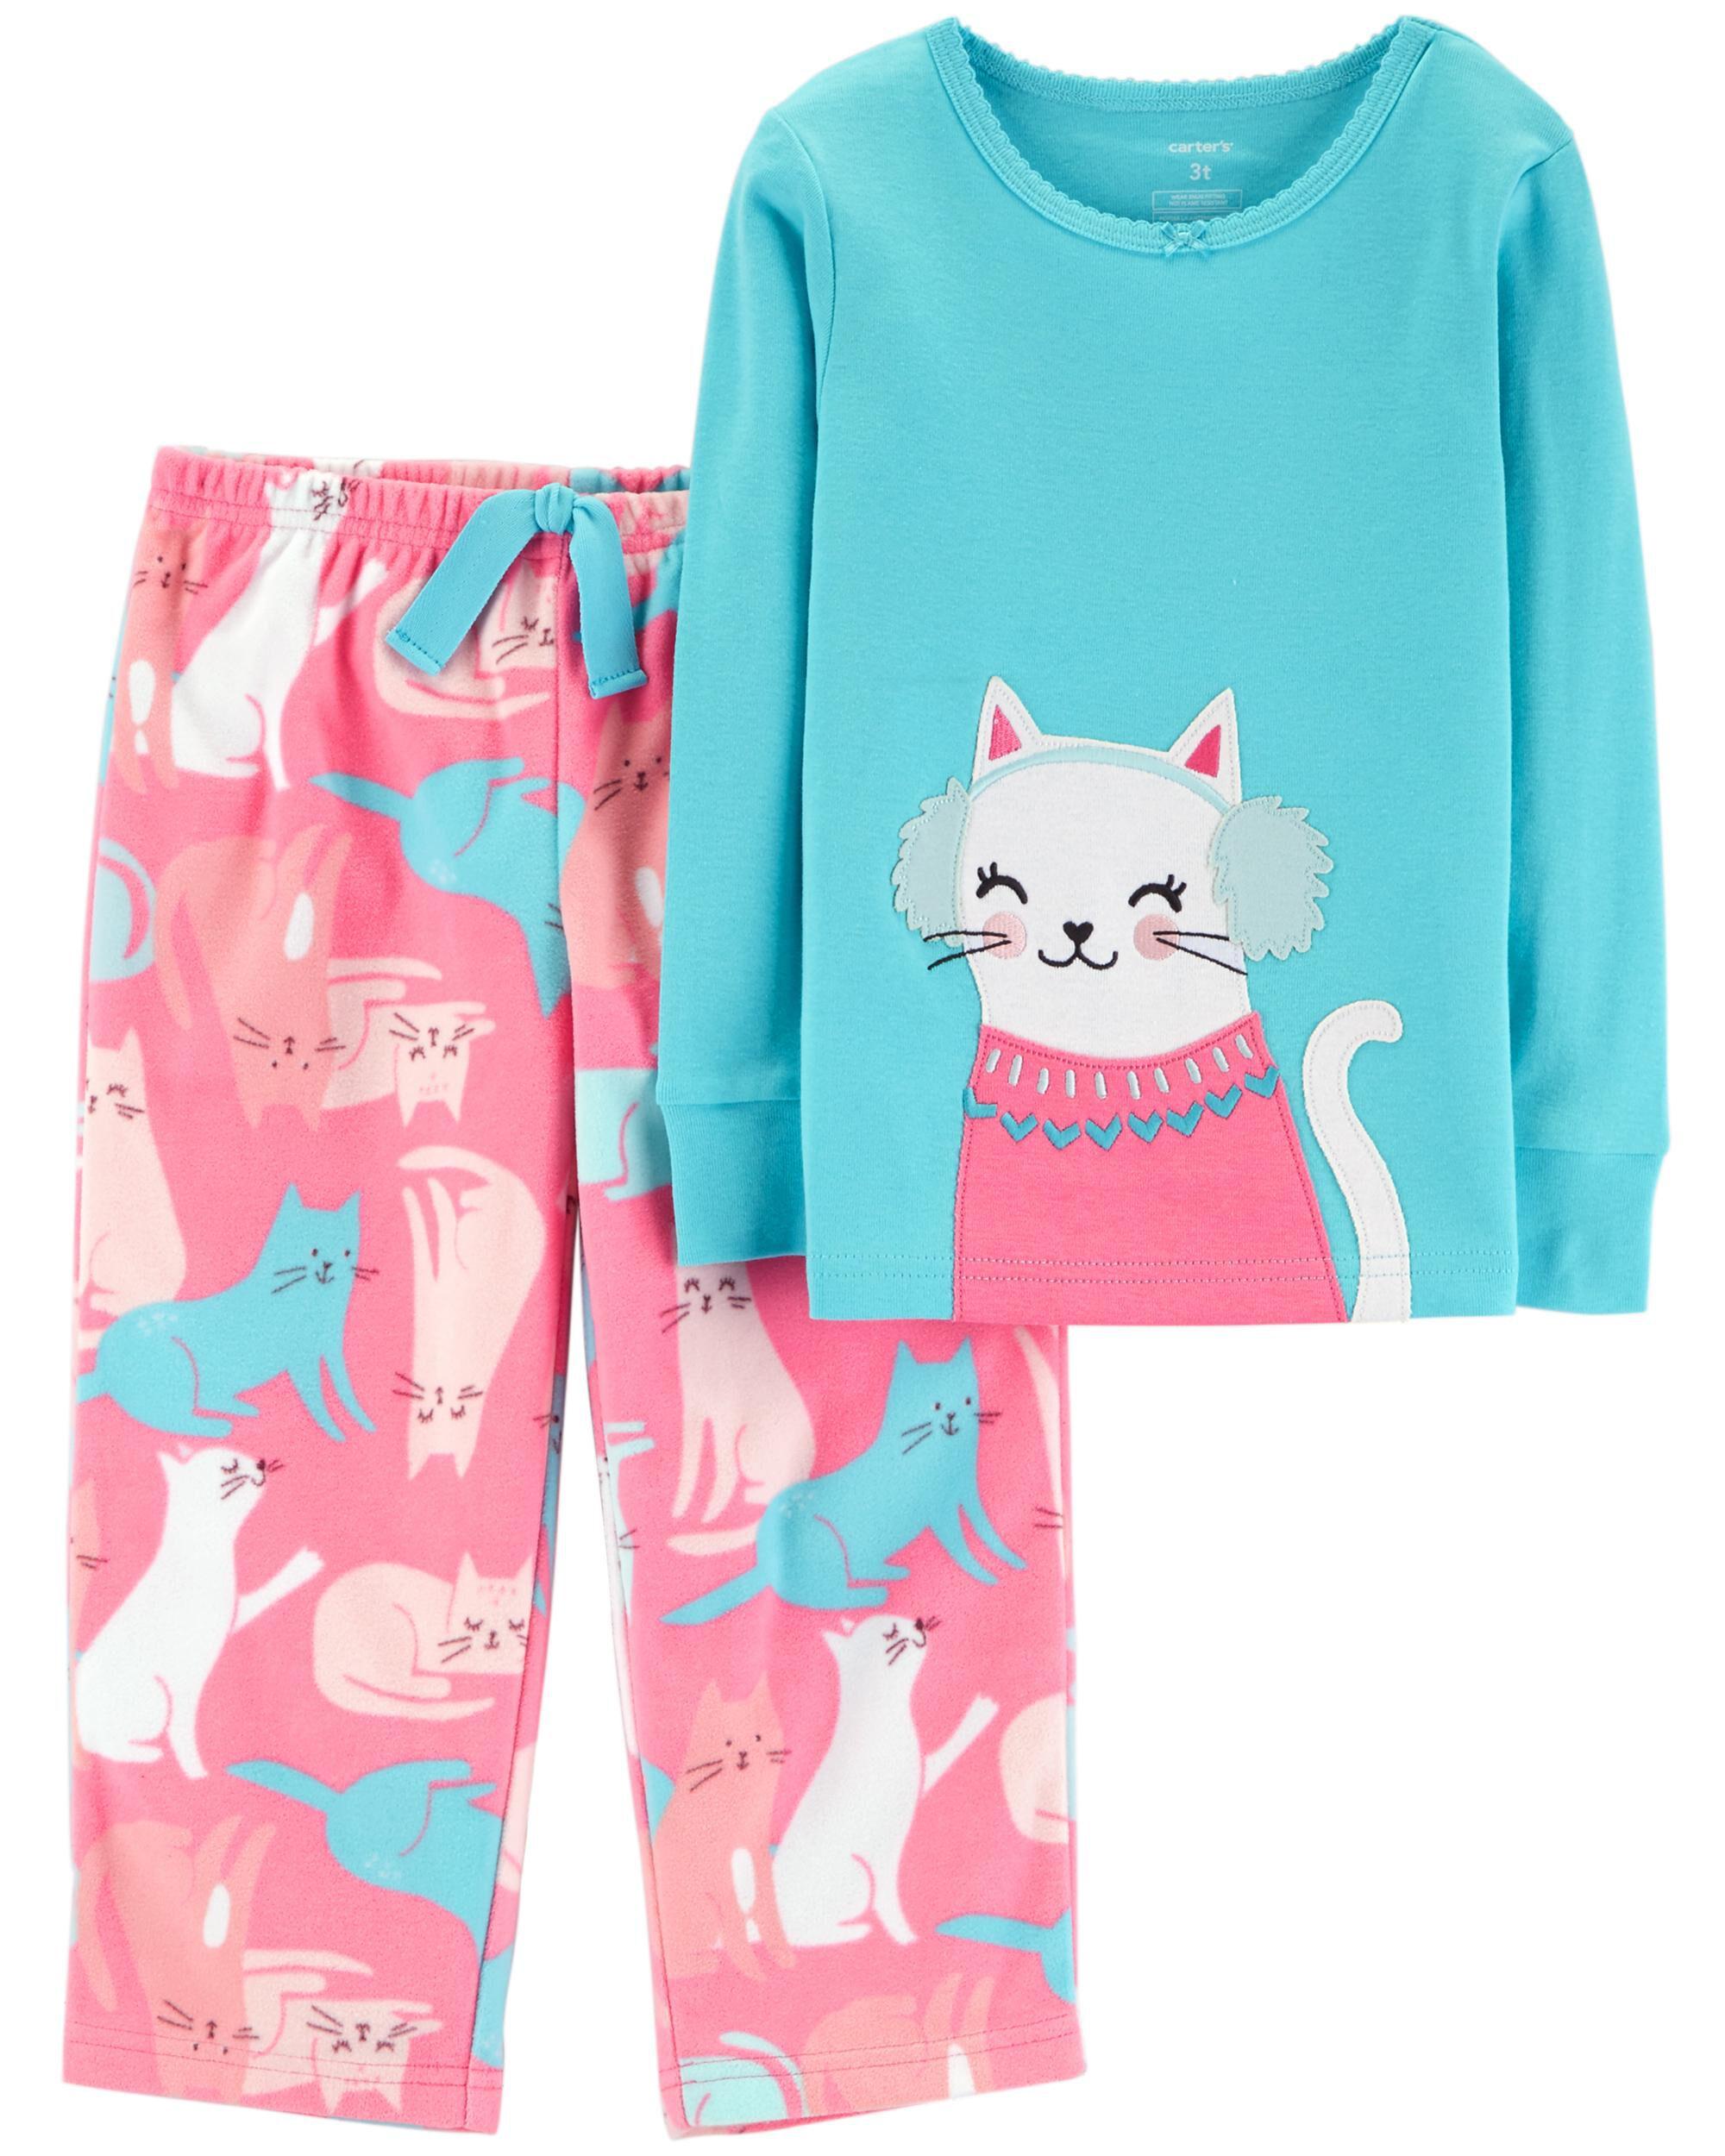 a9a4459287d5 2-Piece Snow Kitty Snug Fit Cotton   Fleece PJs